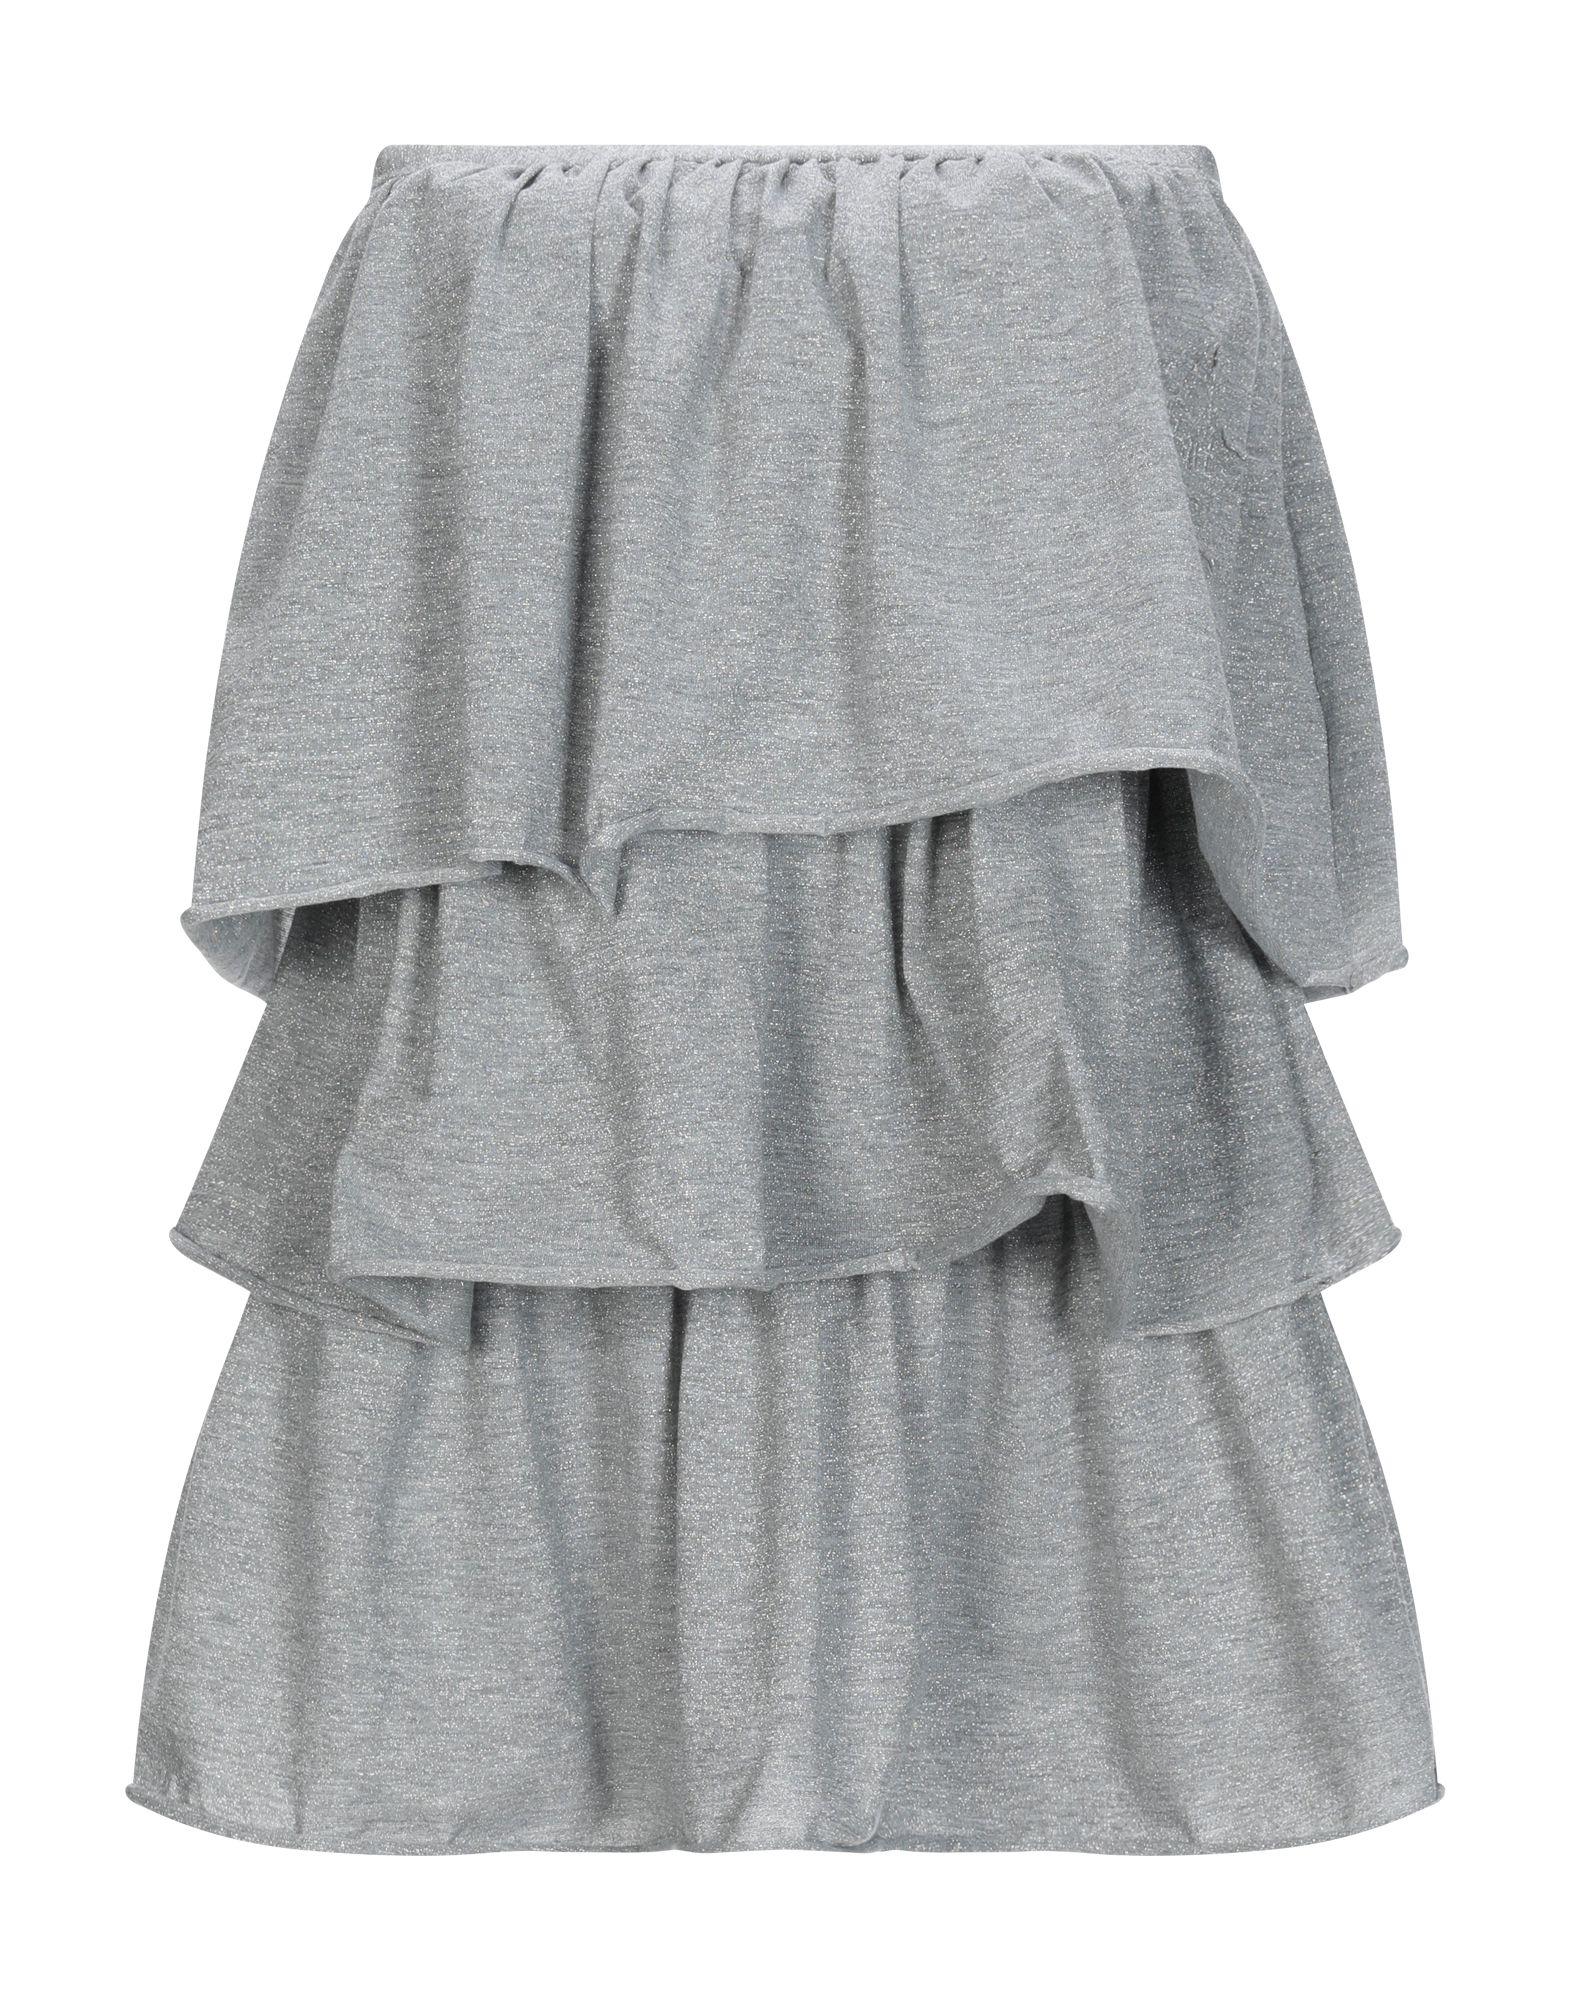 Фото - T+ART Короткое платье t skirt зеленое короткое платье